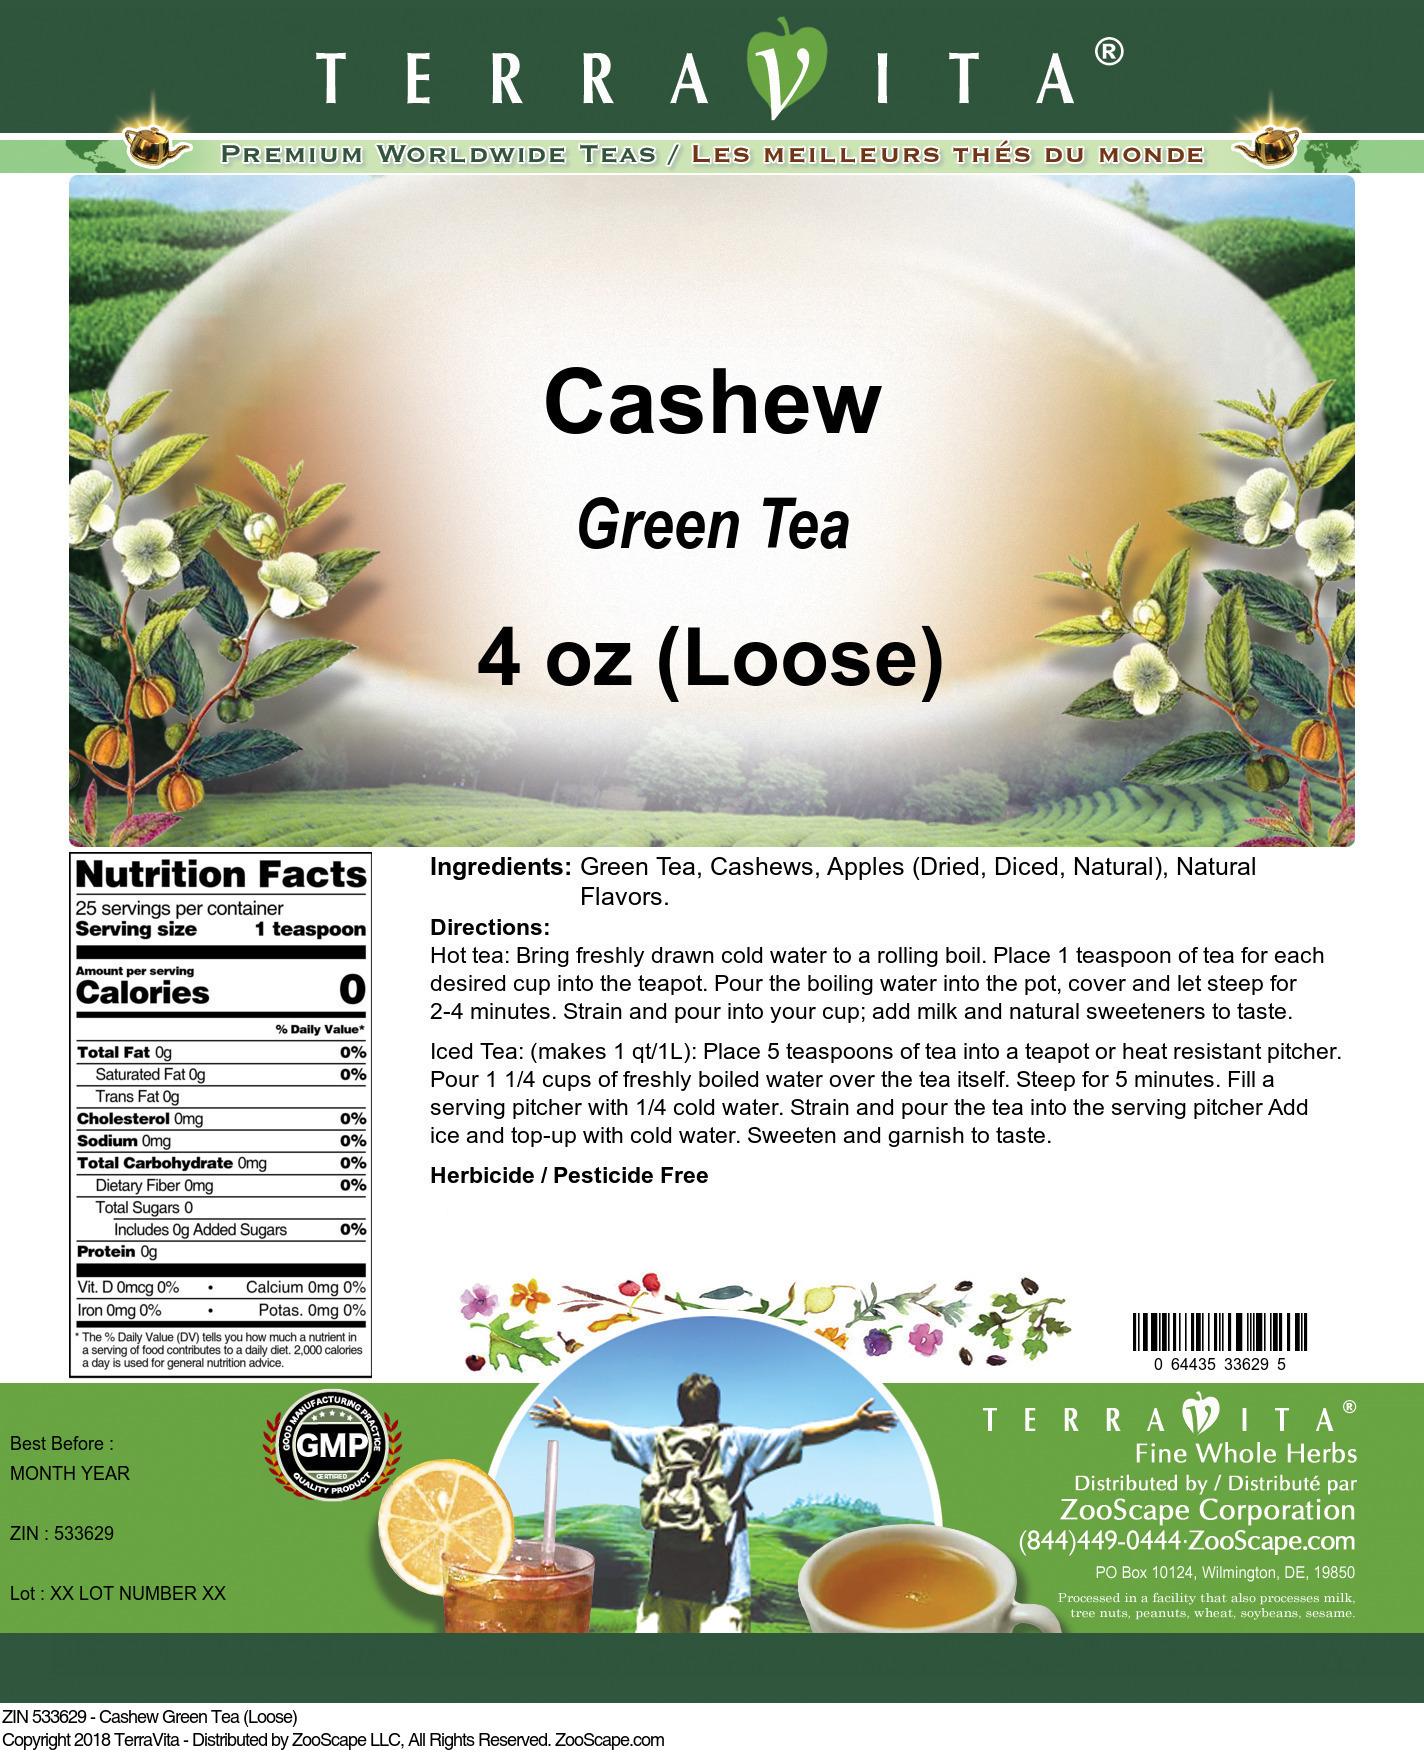 Cashew Green Tea